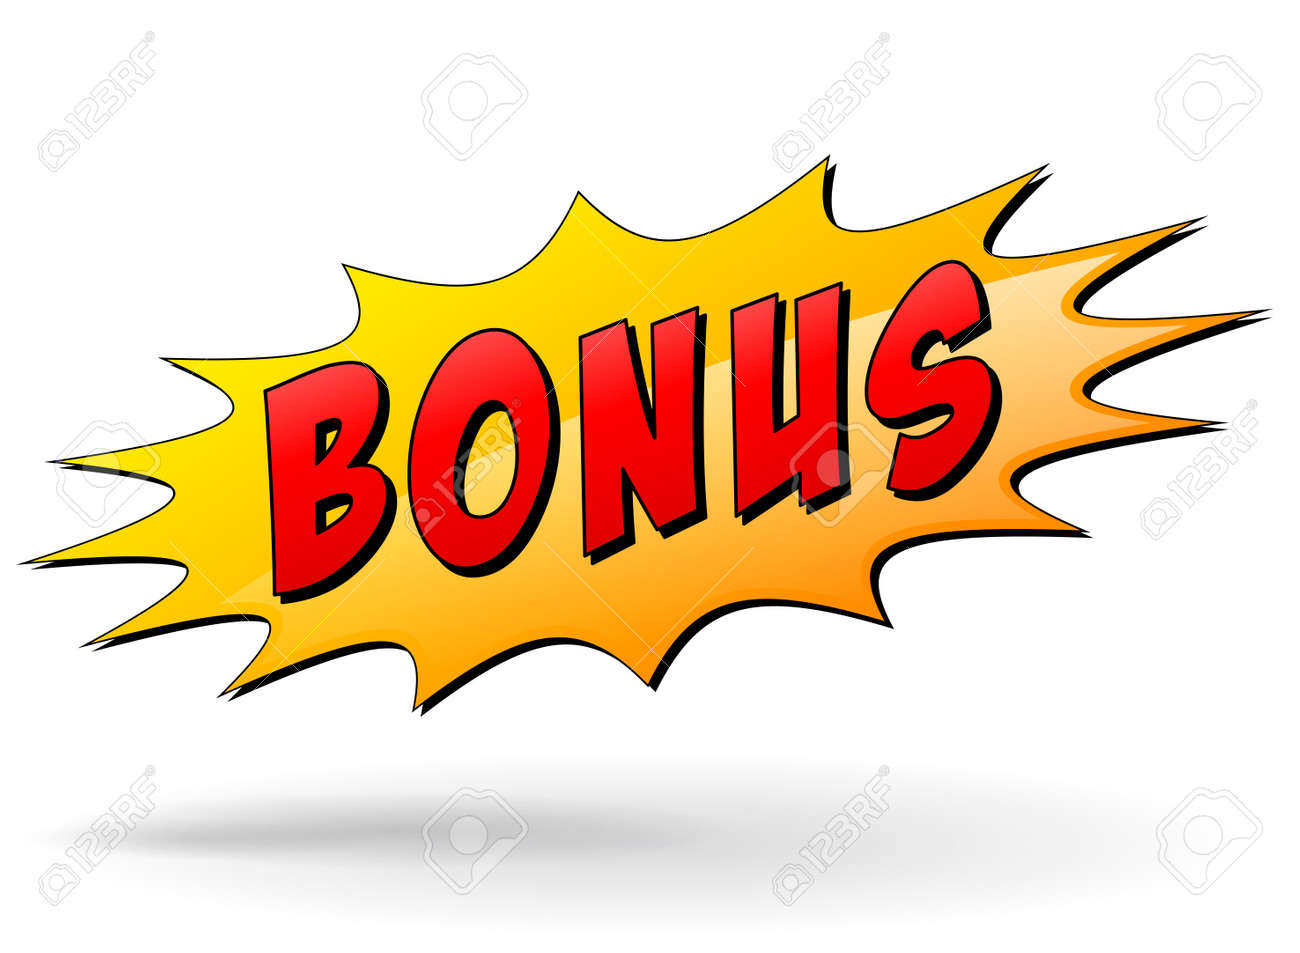 Bonus Stock Photos. Royalty Free Bonus Images